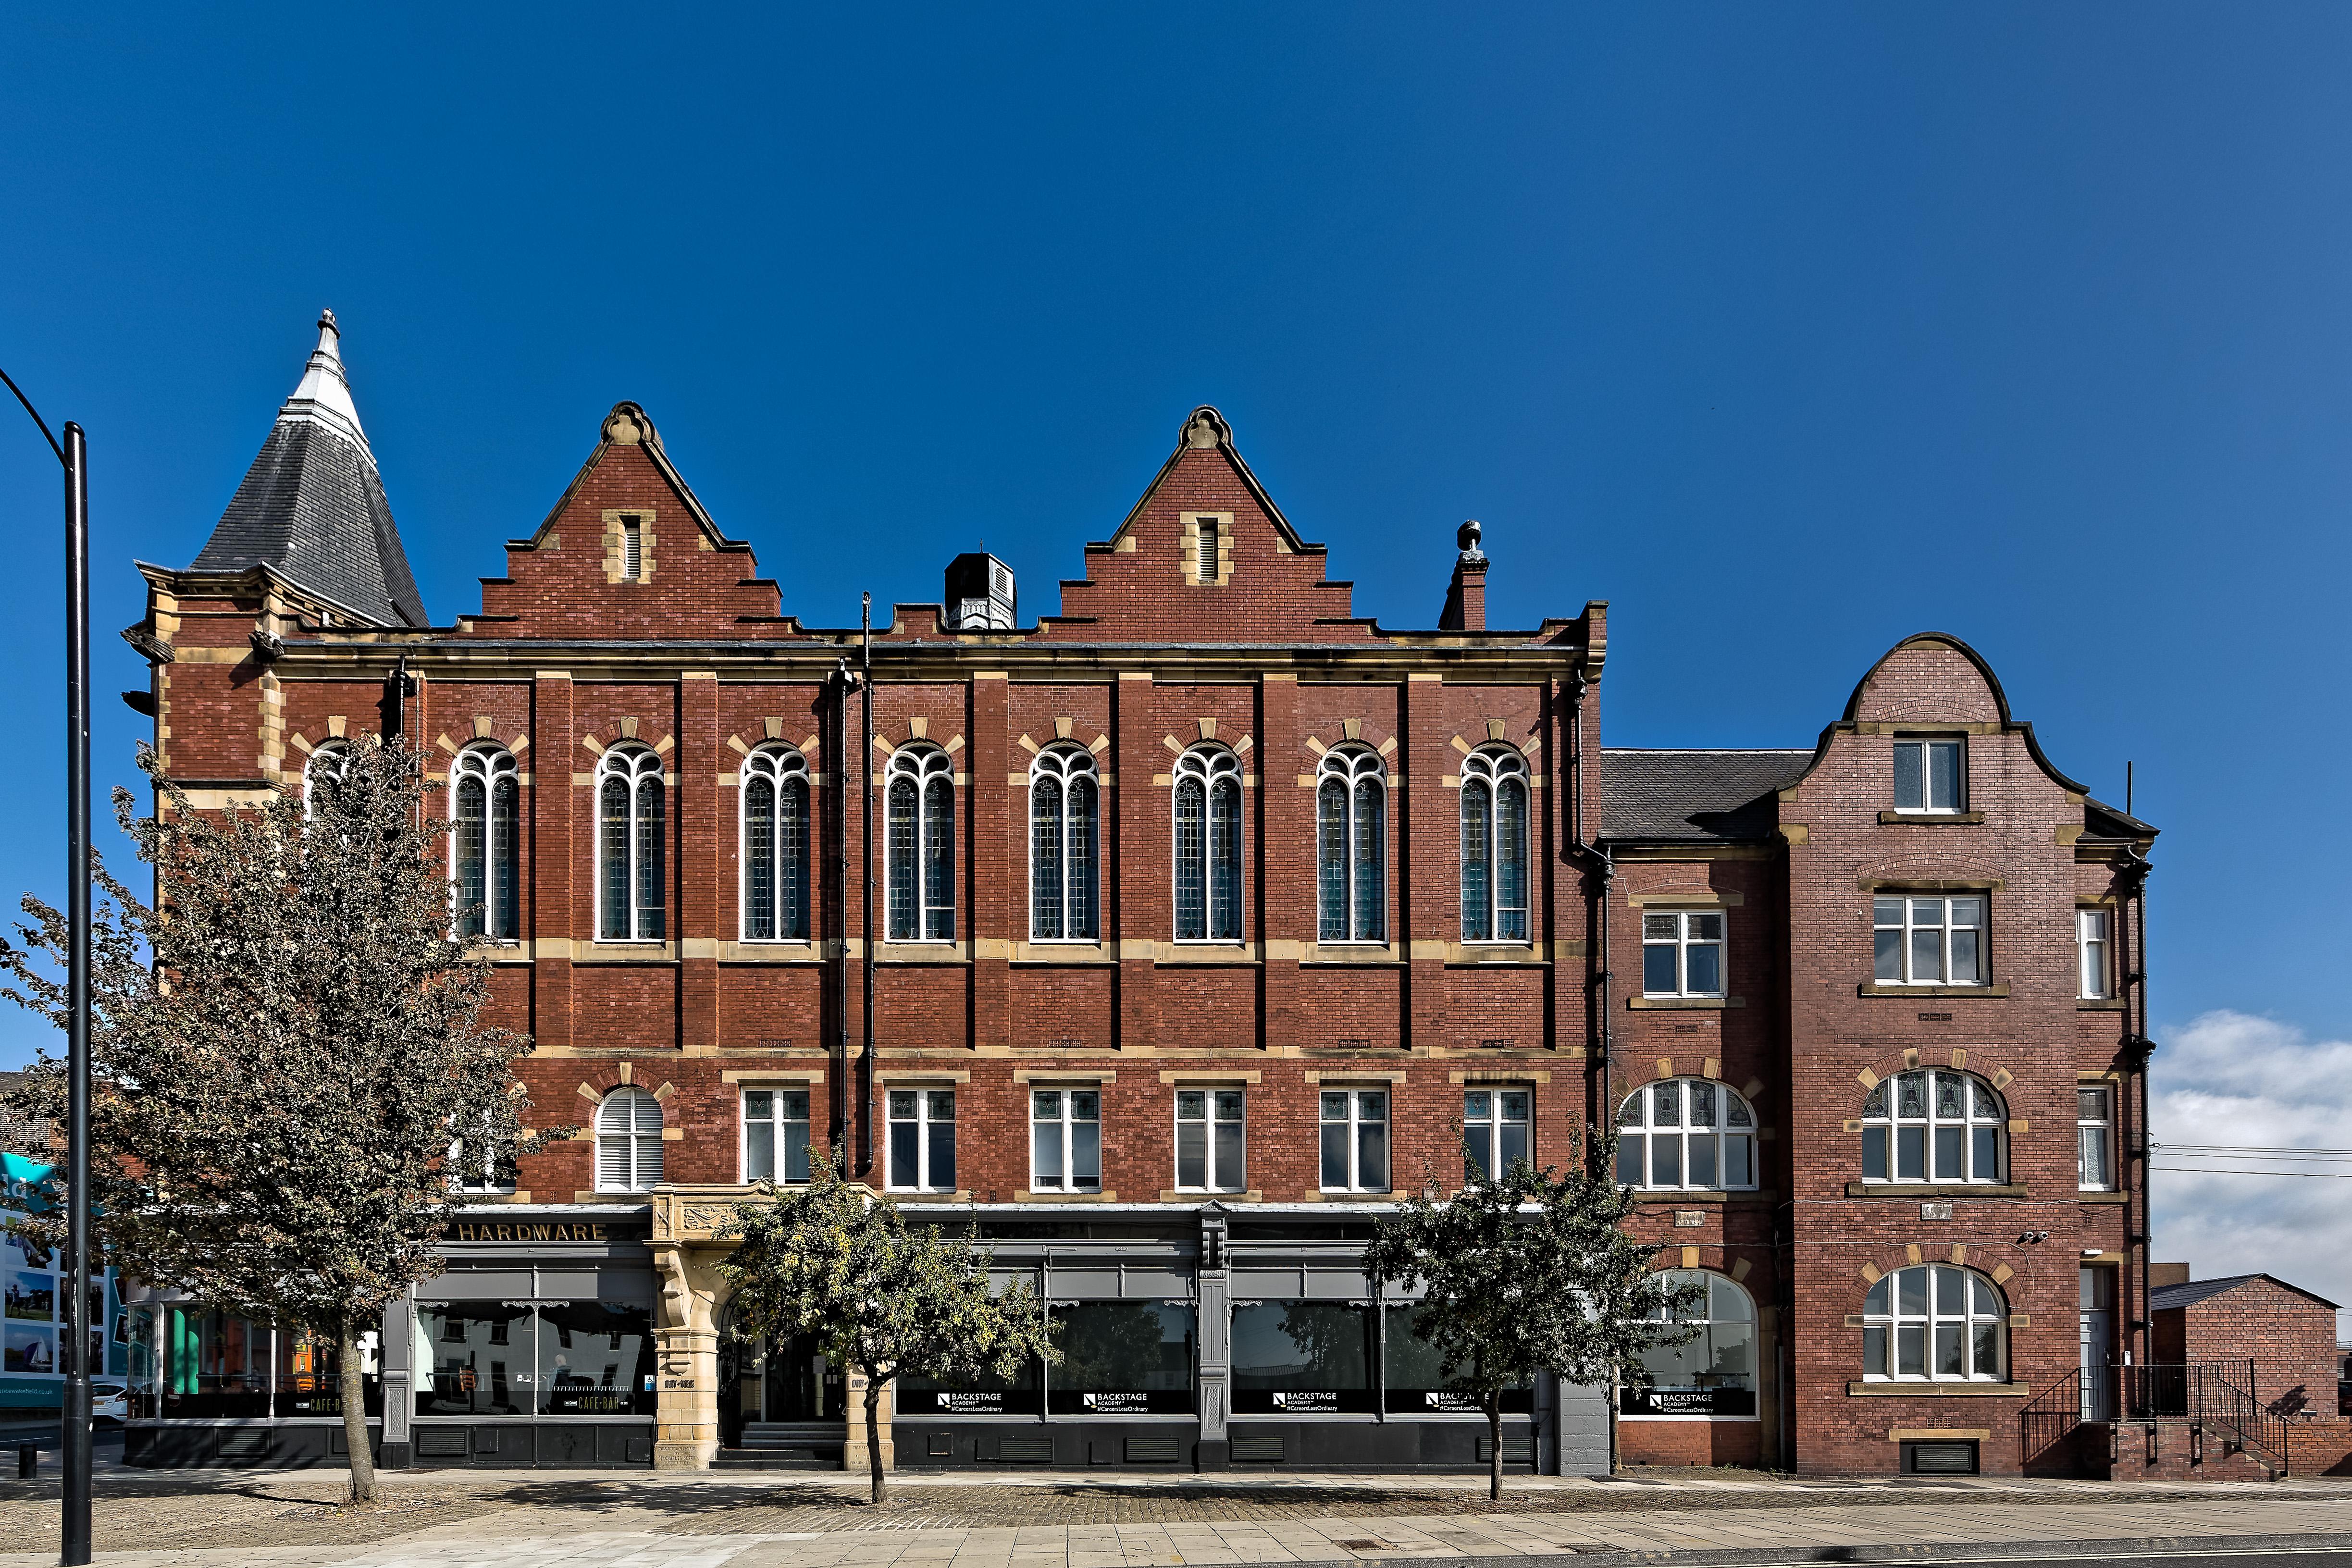 Independent Building Refurbishment Ltd